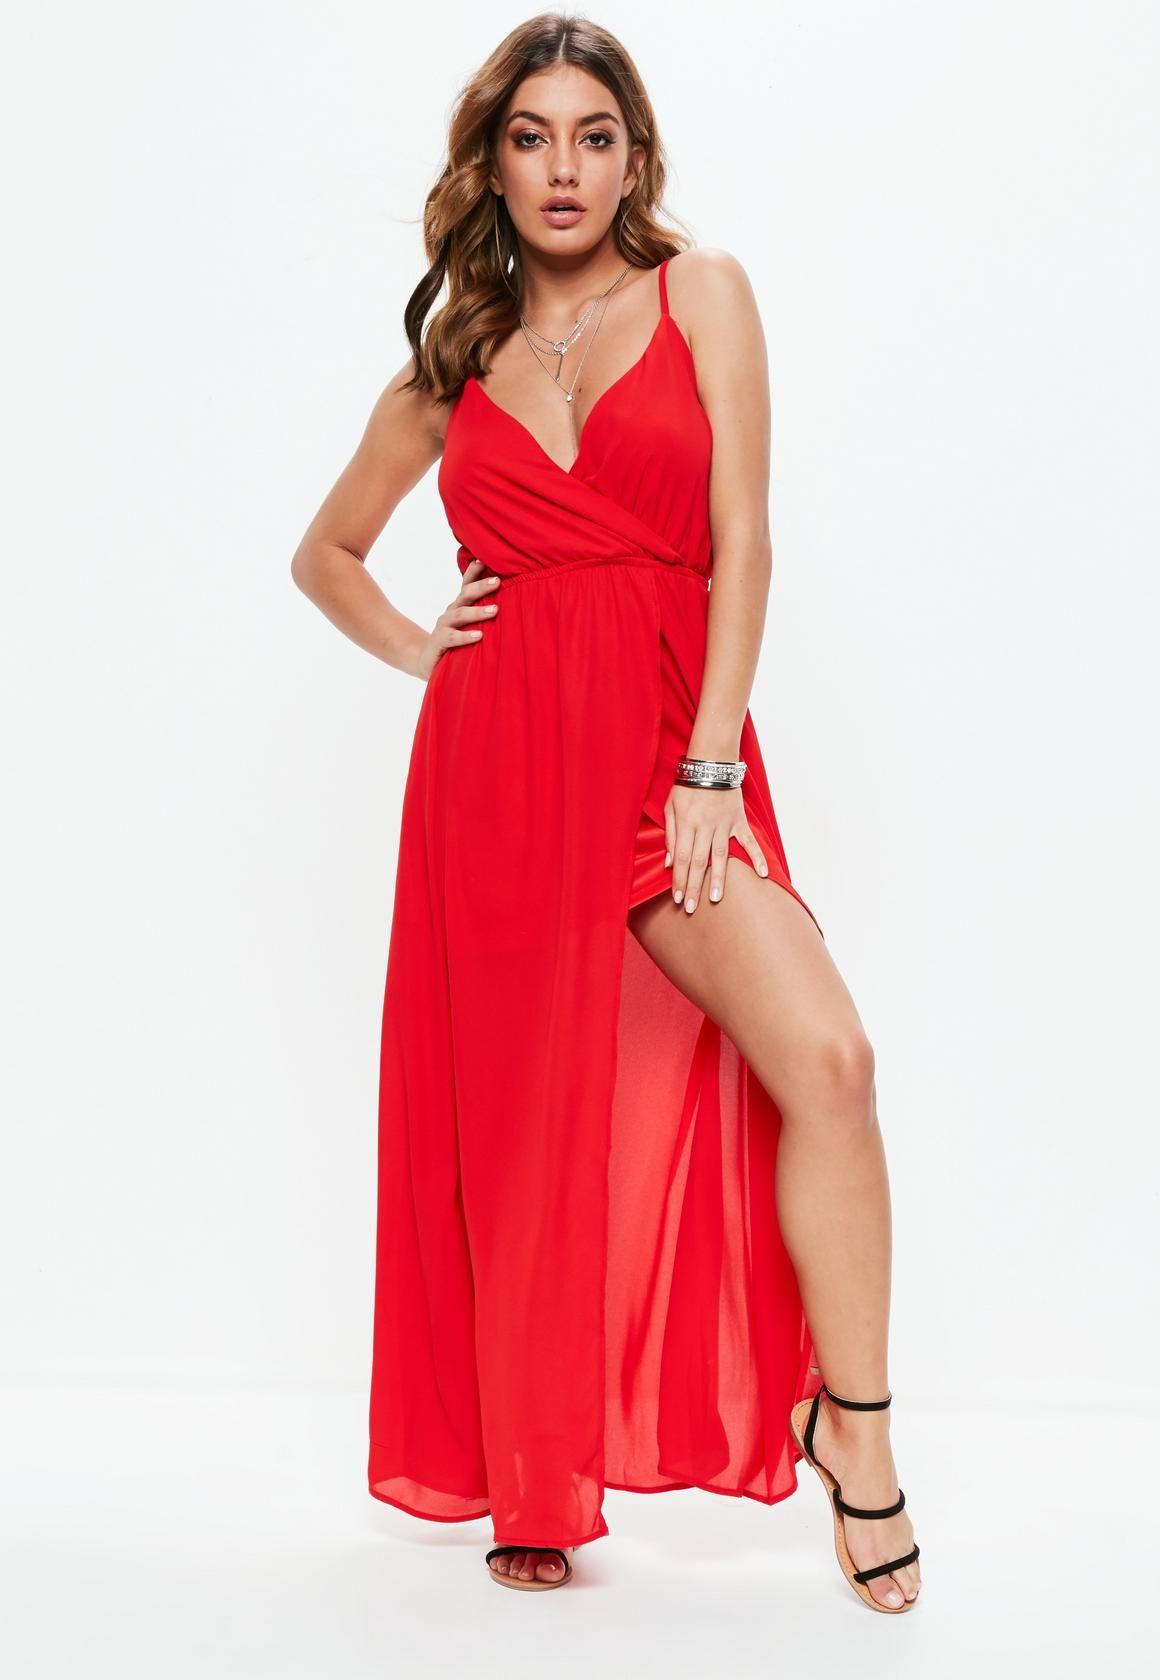 Missguided Czerwona Sukienka Maxi Na Ramiaczkach Cute Dresses Dresses Long Red Dress